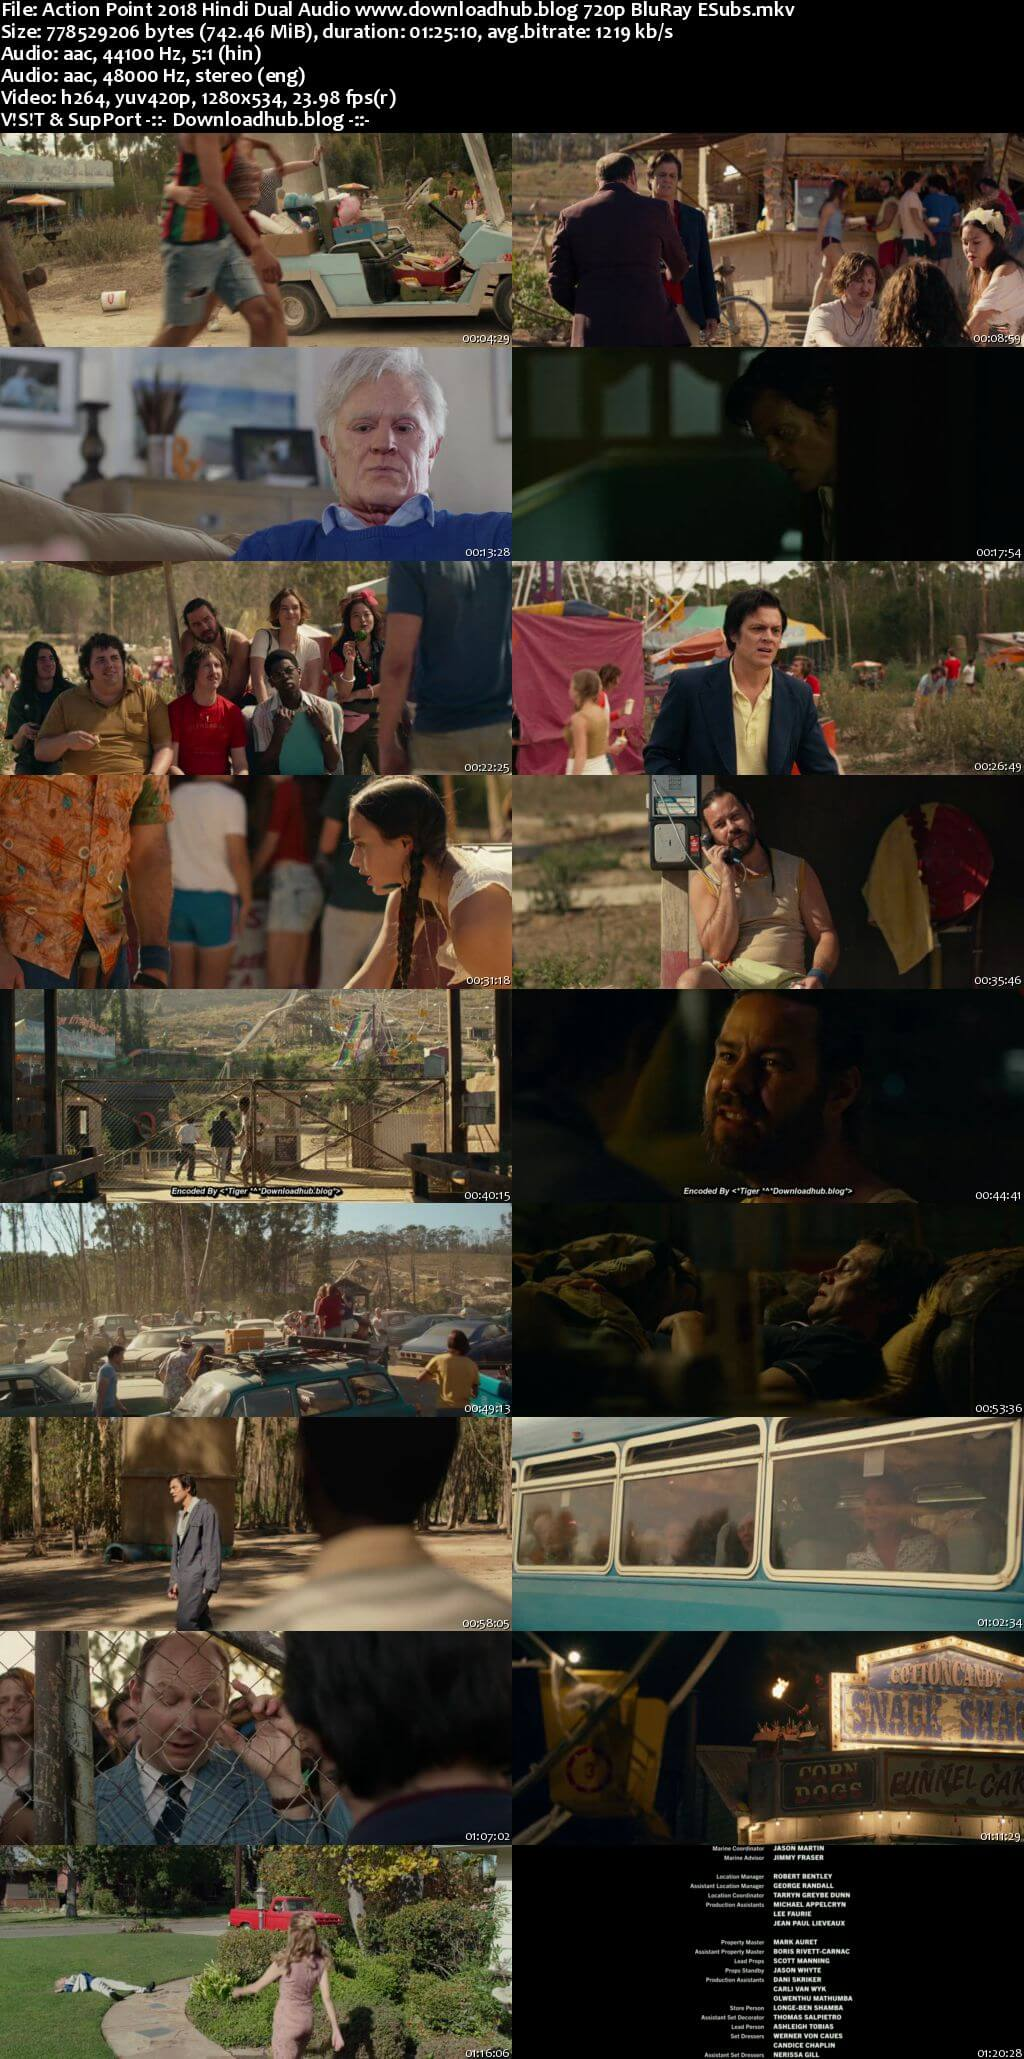 Action Point 2018 Hindi Dual Audio 720p BluRay ESubs